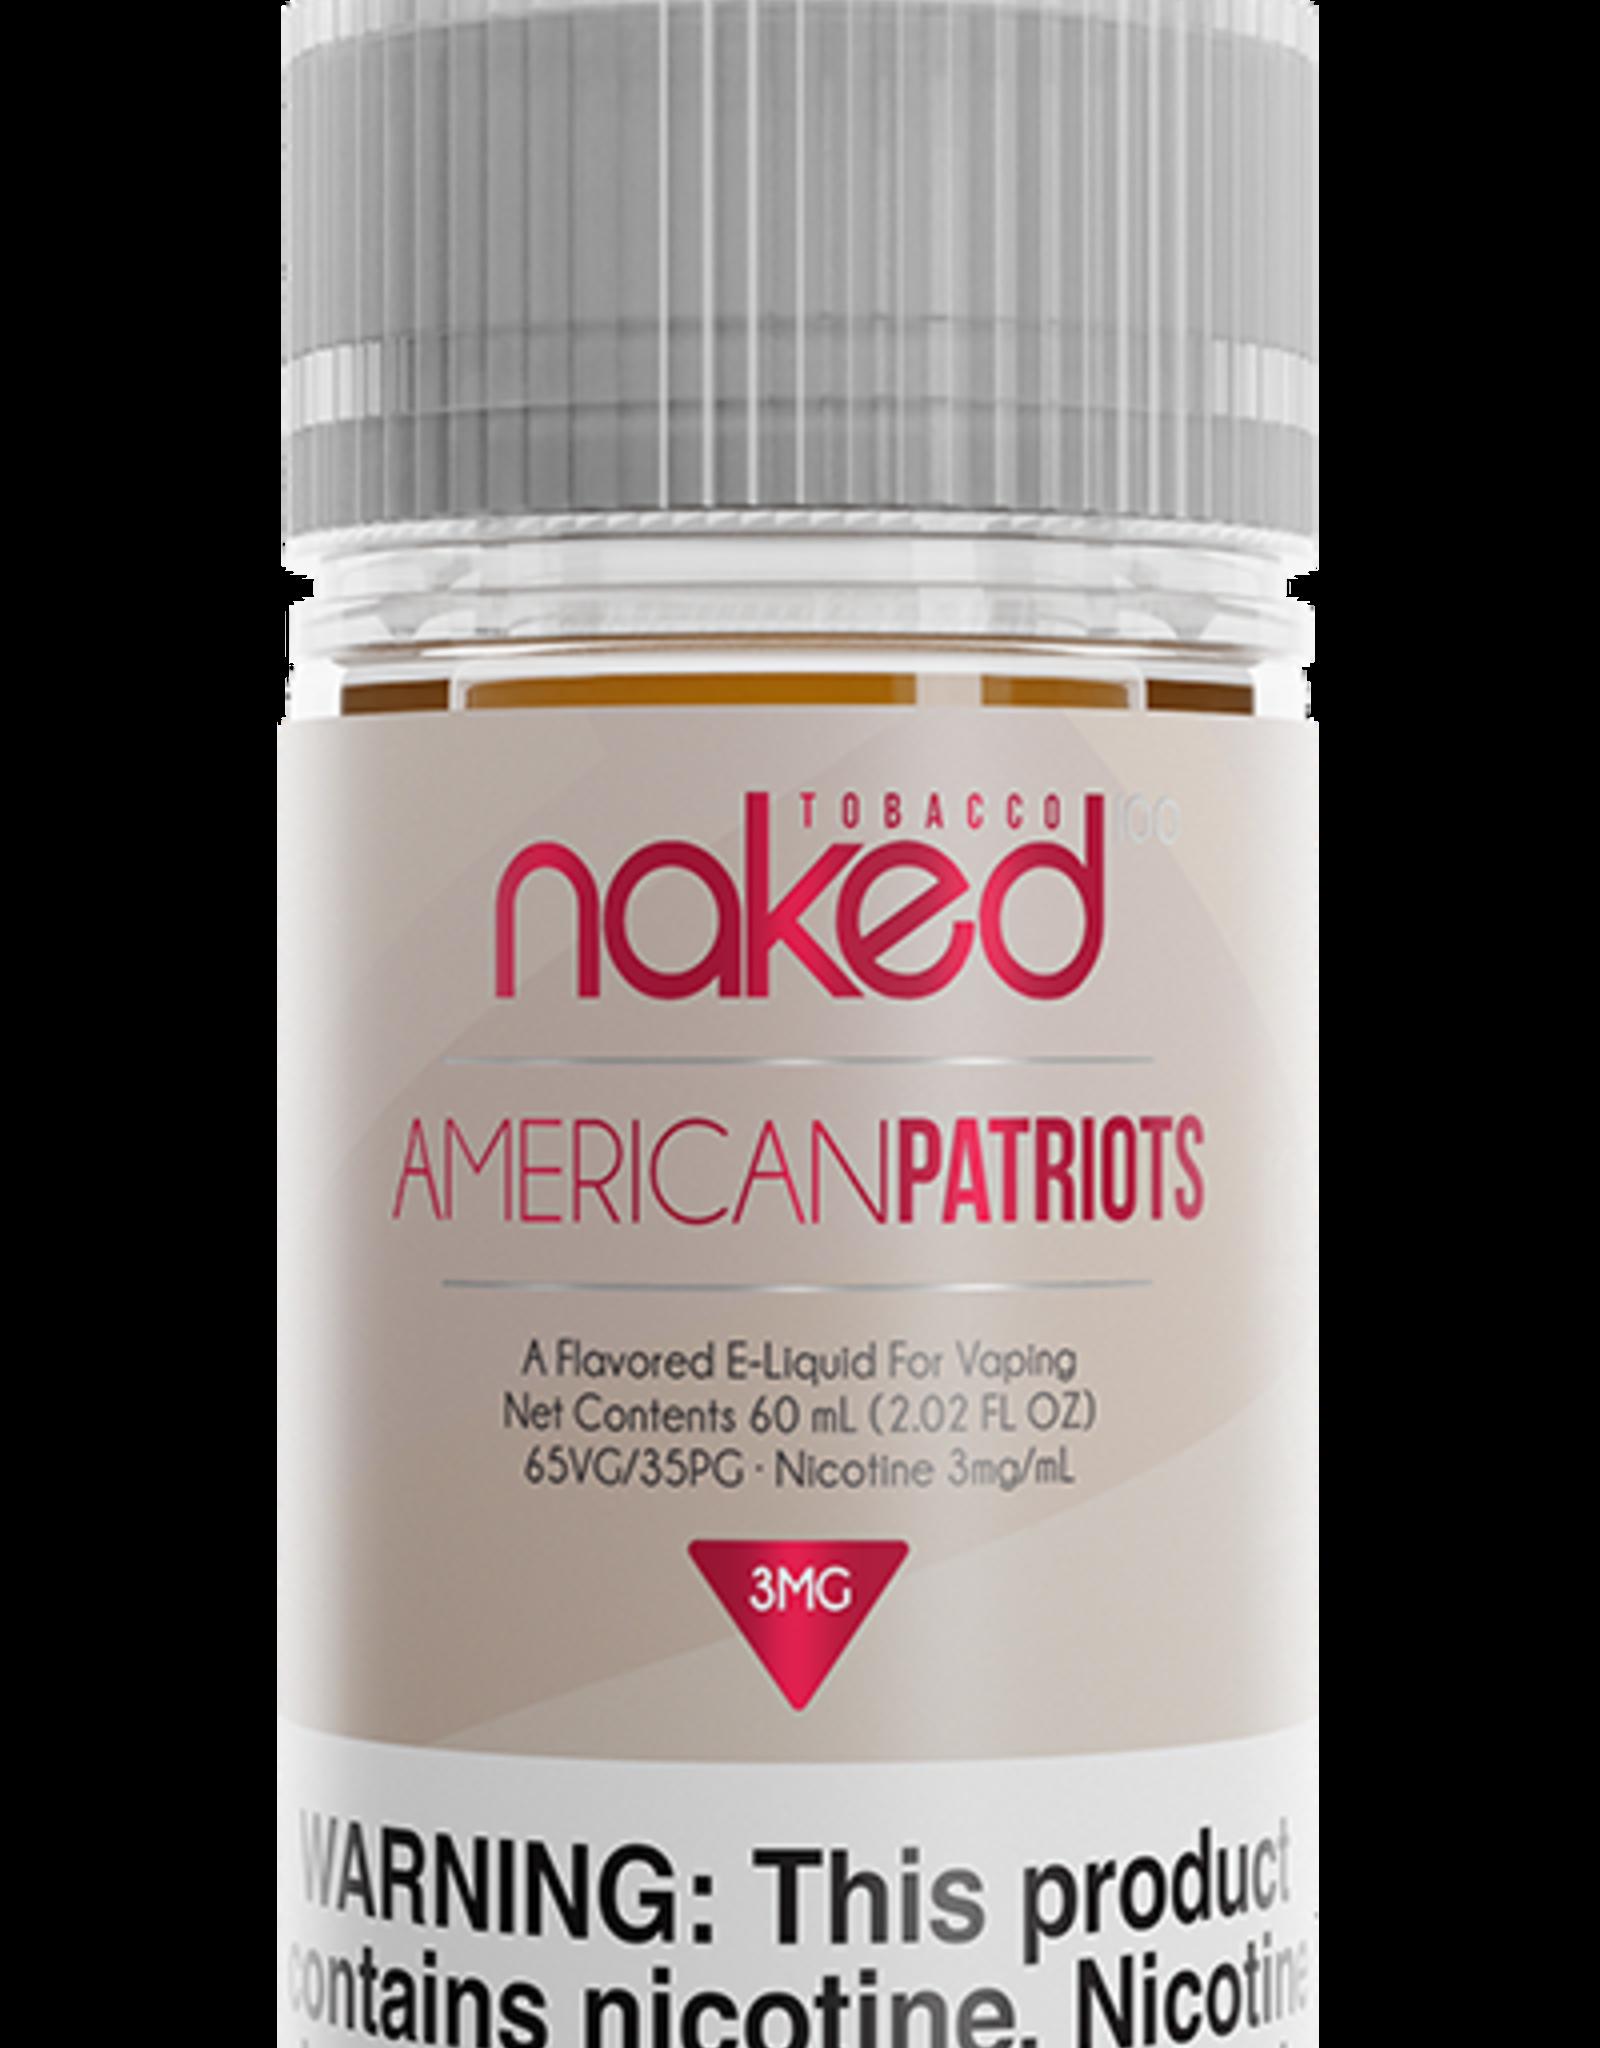 Naked 100 American Patriots